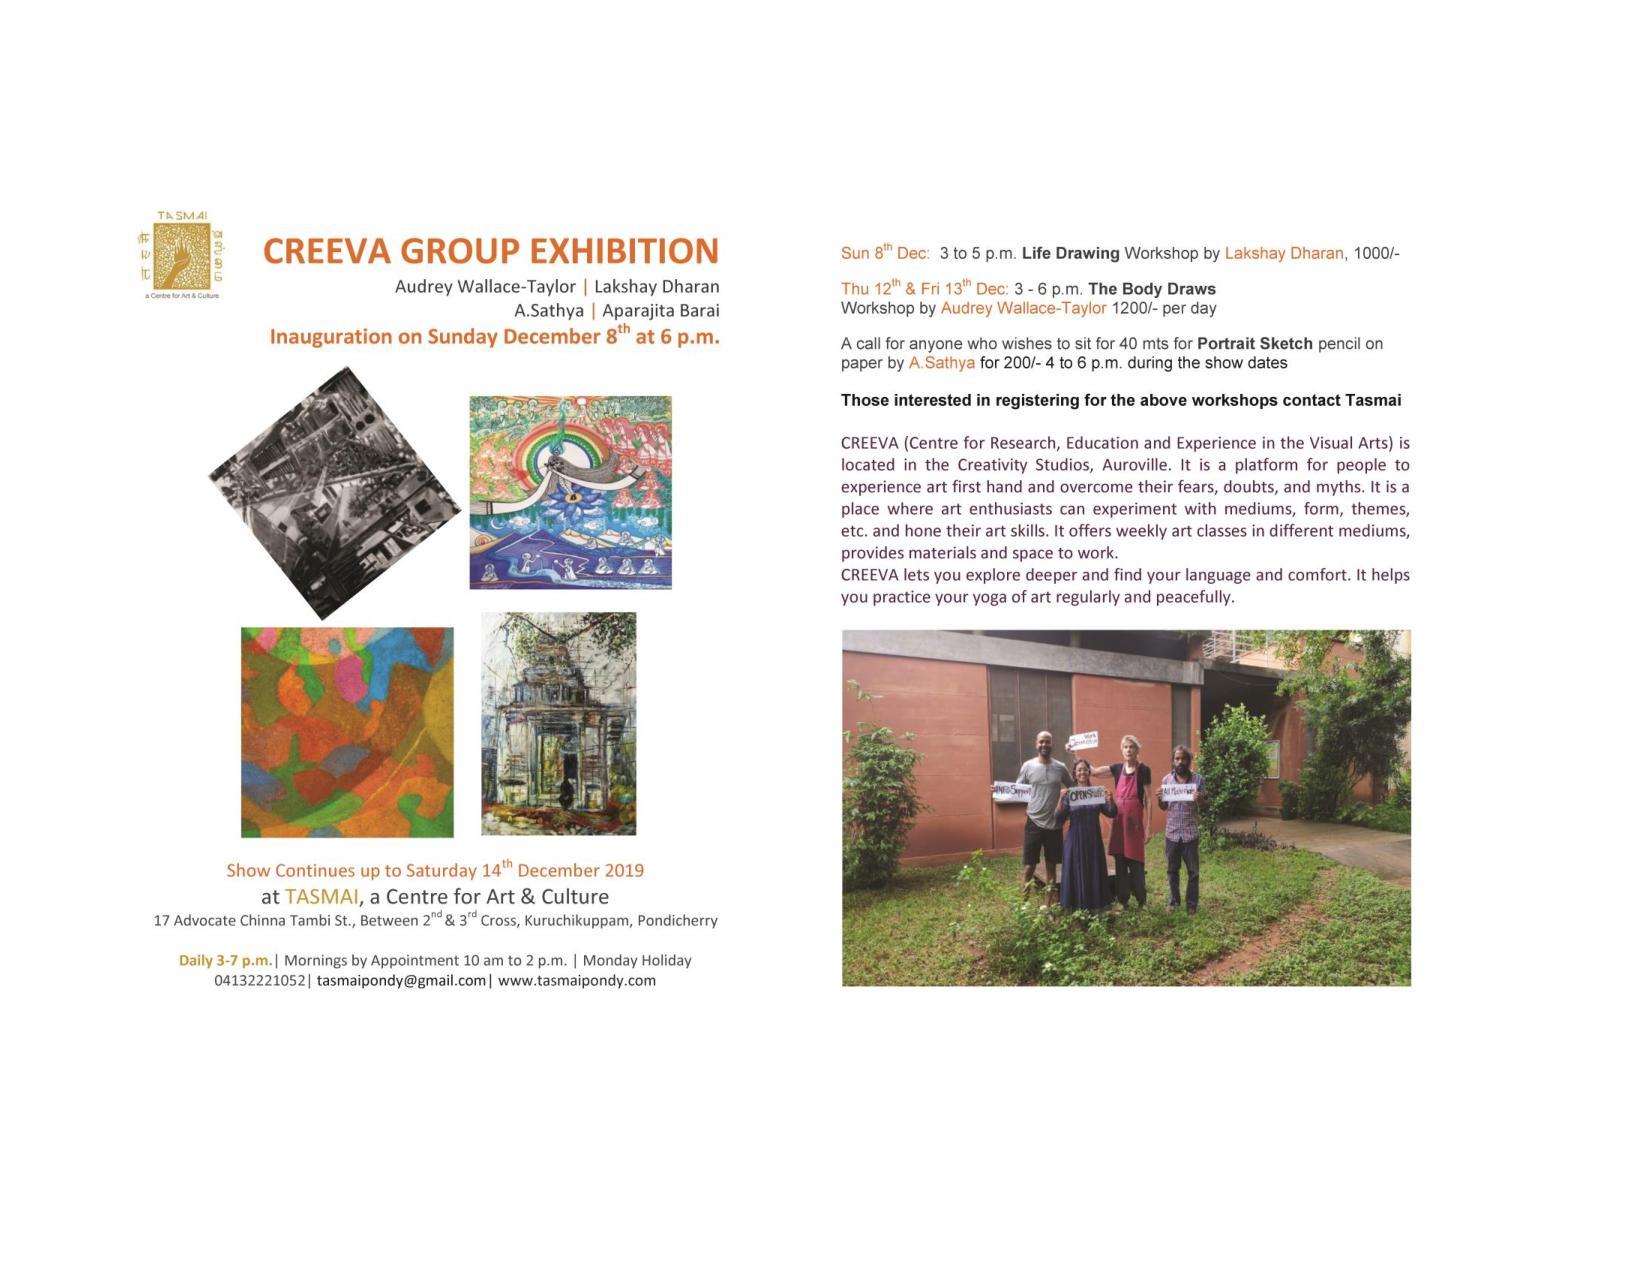 Creeva Group Exhibition at TASMAI